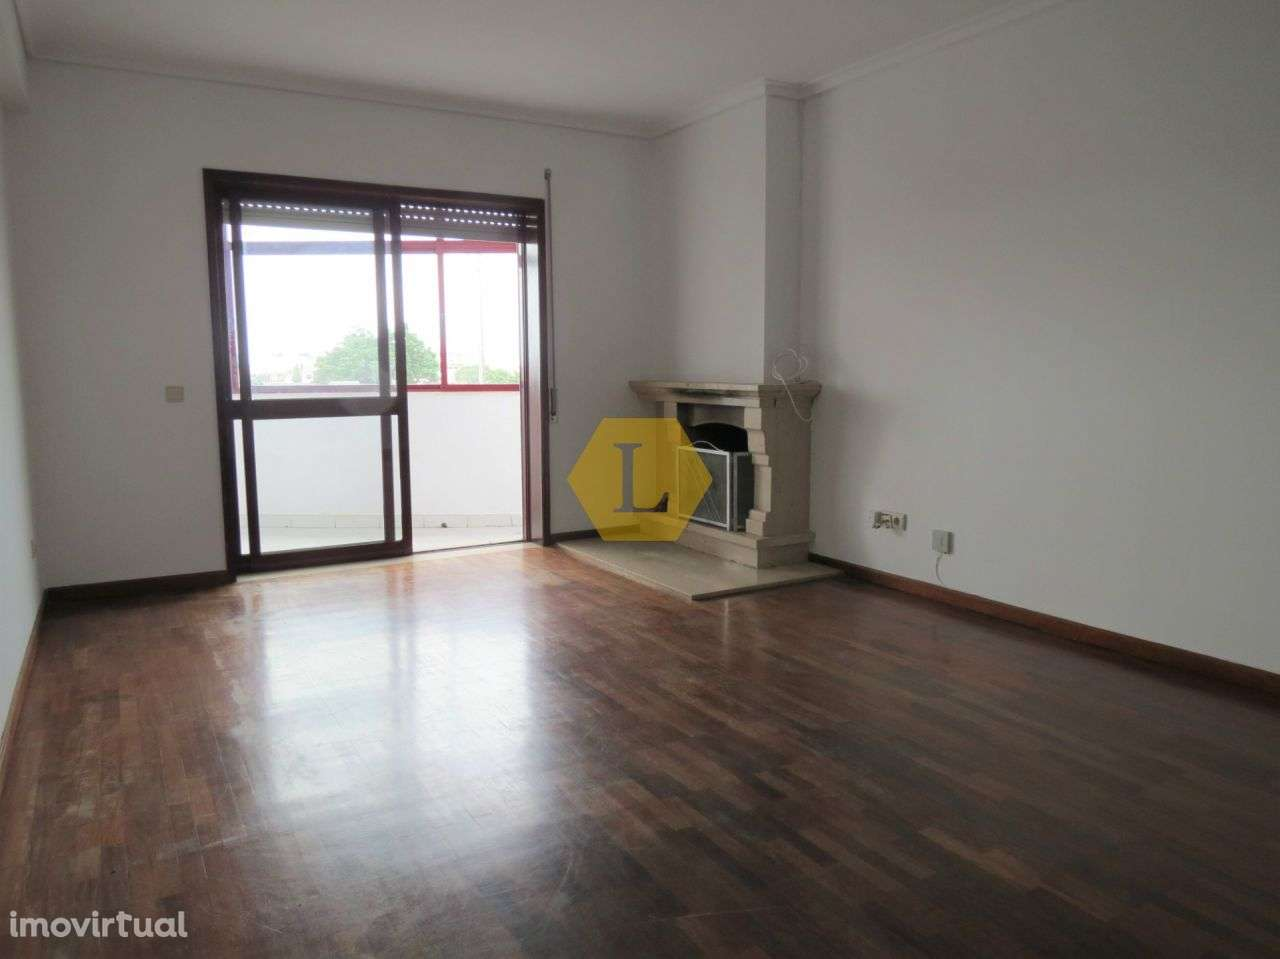 Apartamento para comprar, Gafanha da Nazaré, Aveiro - Foto 18